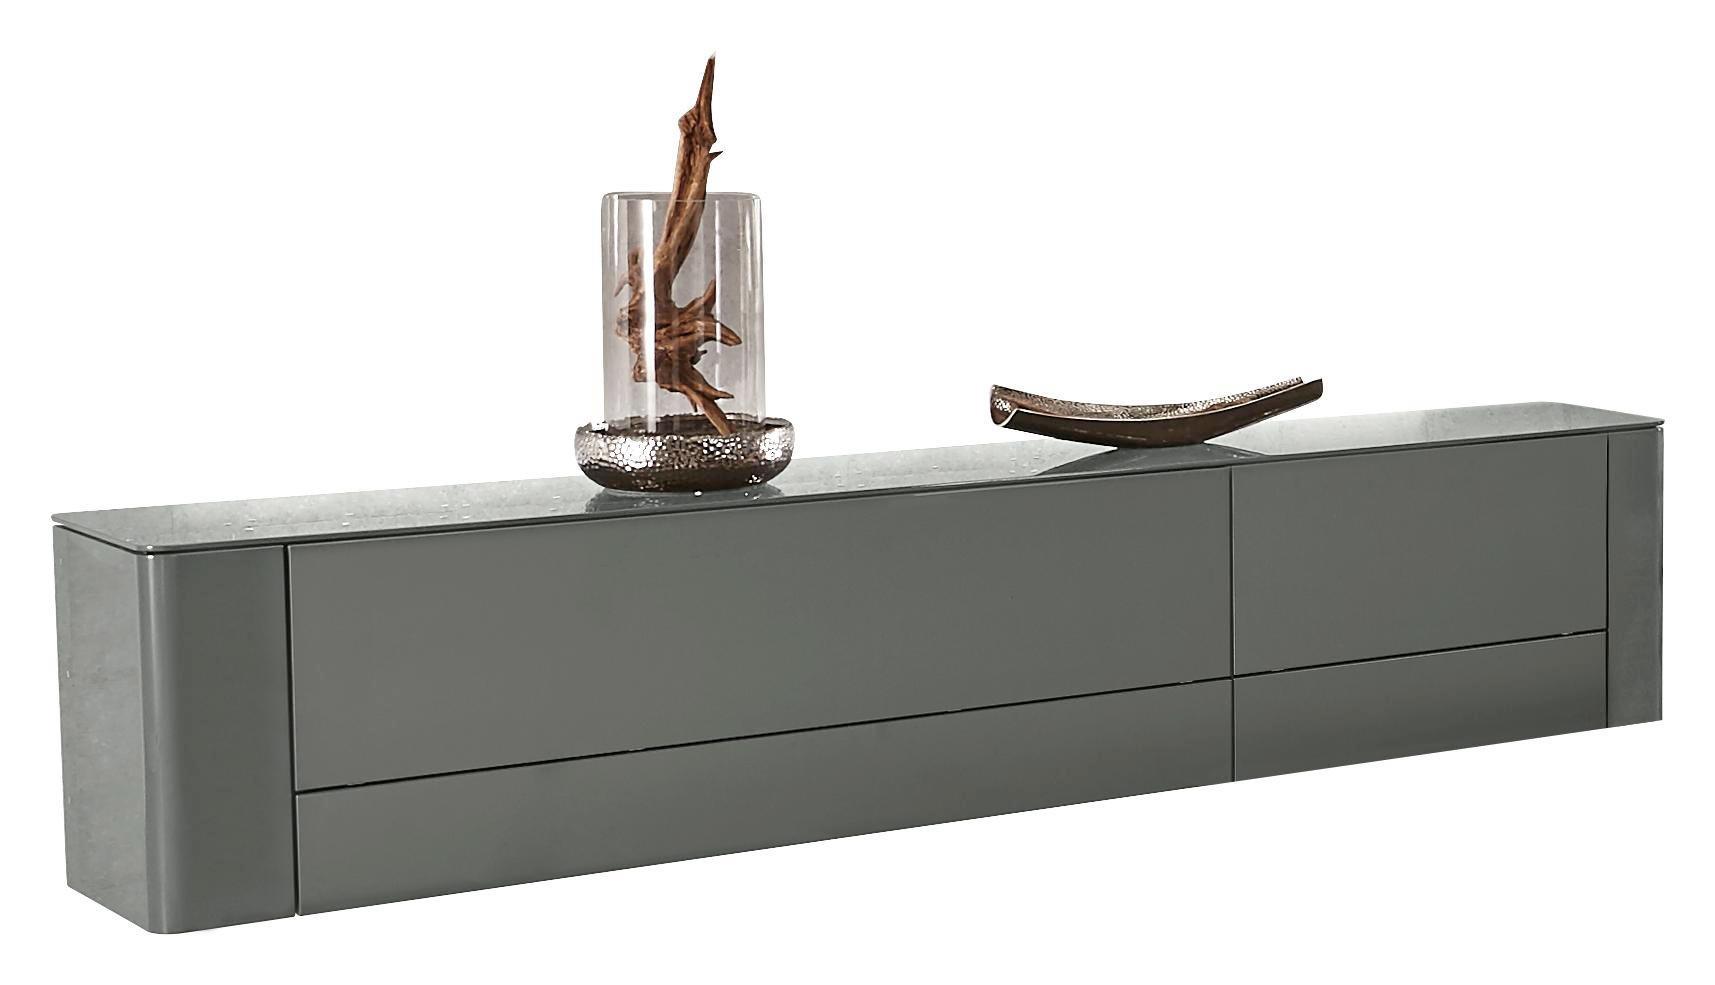 Charming Cool Lowboard Grau Hochglanz Schnsten With Lowboard Weiss Haengend